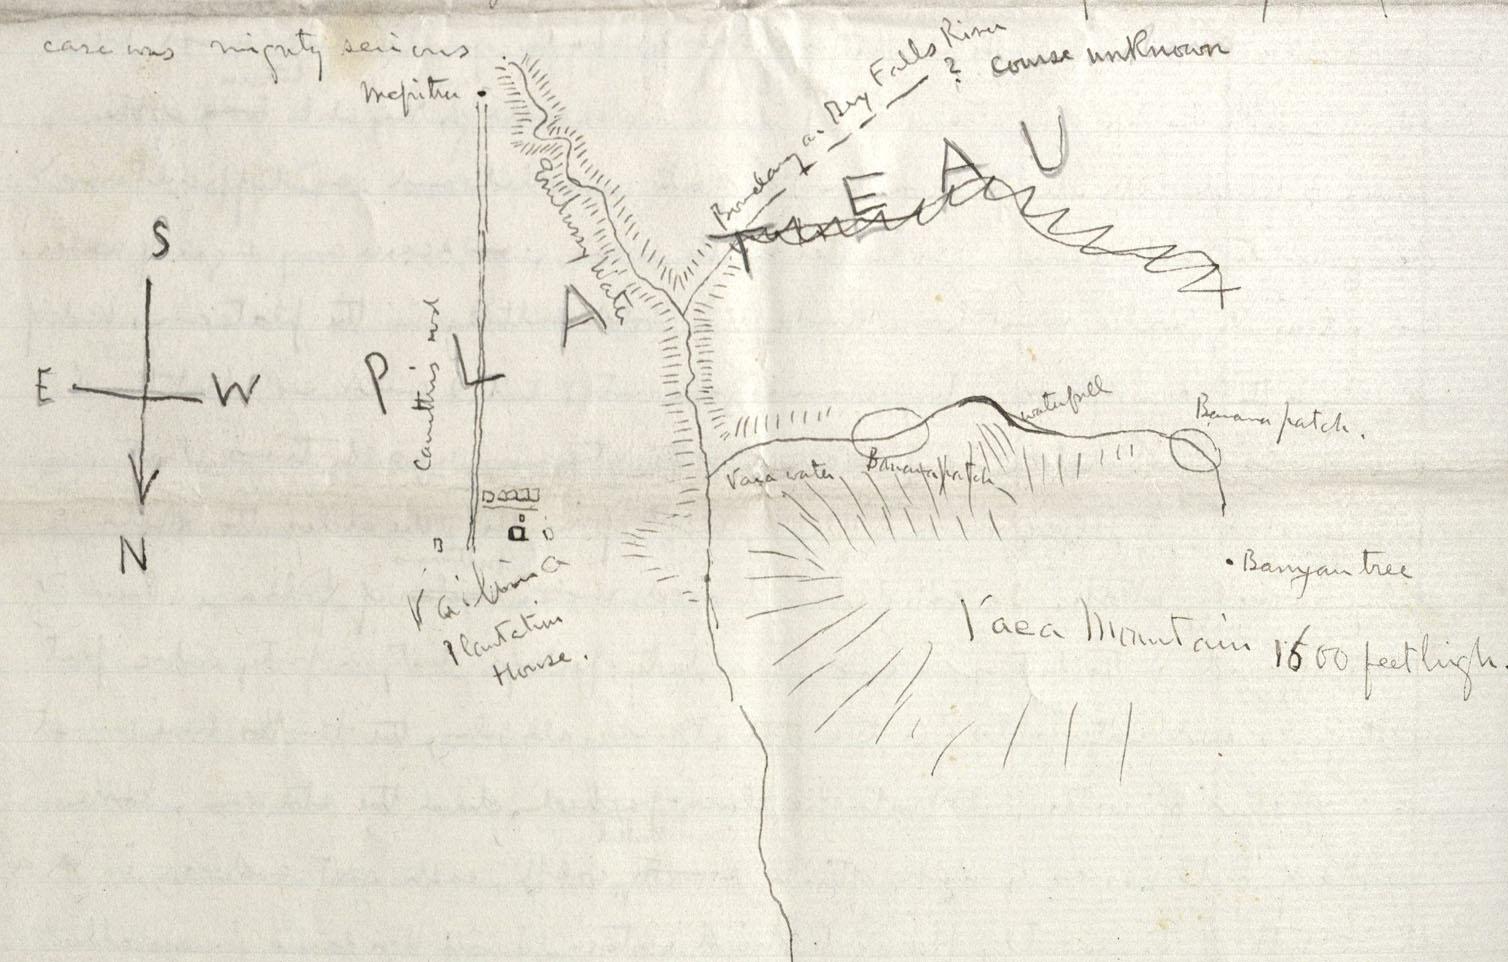 Robert Louis Stevenson. Sketched map. HEW 10.13.21